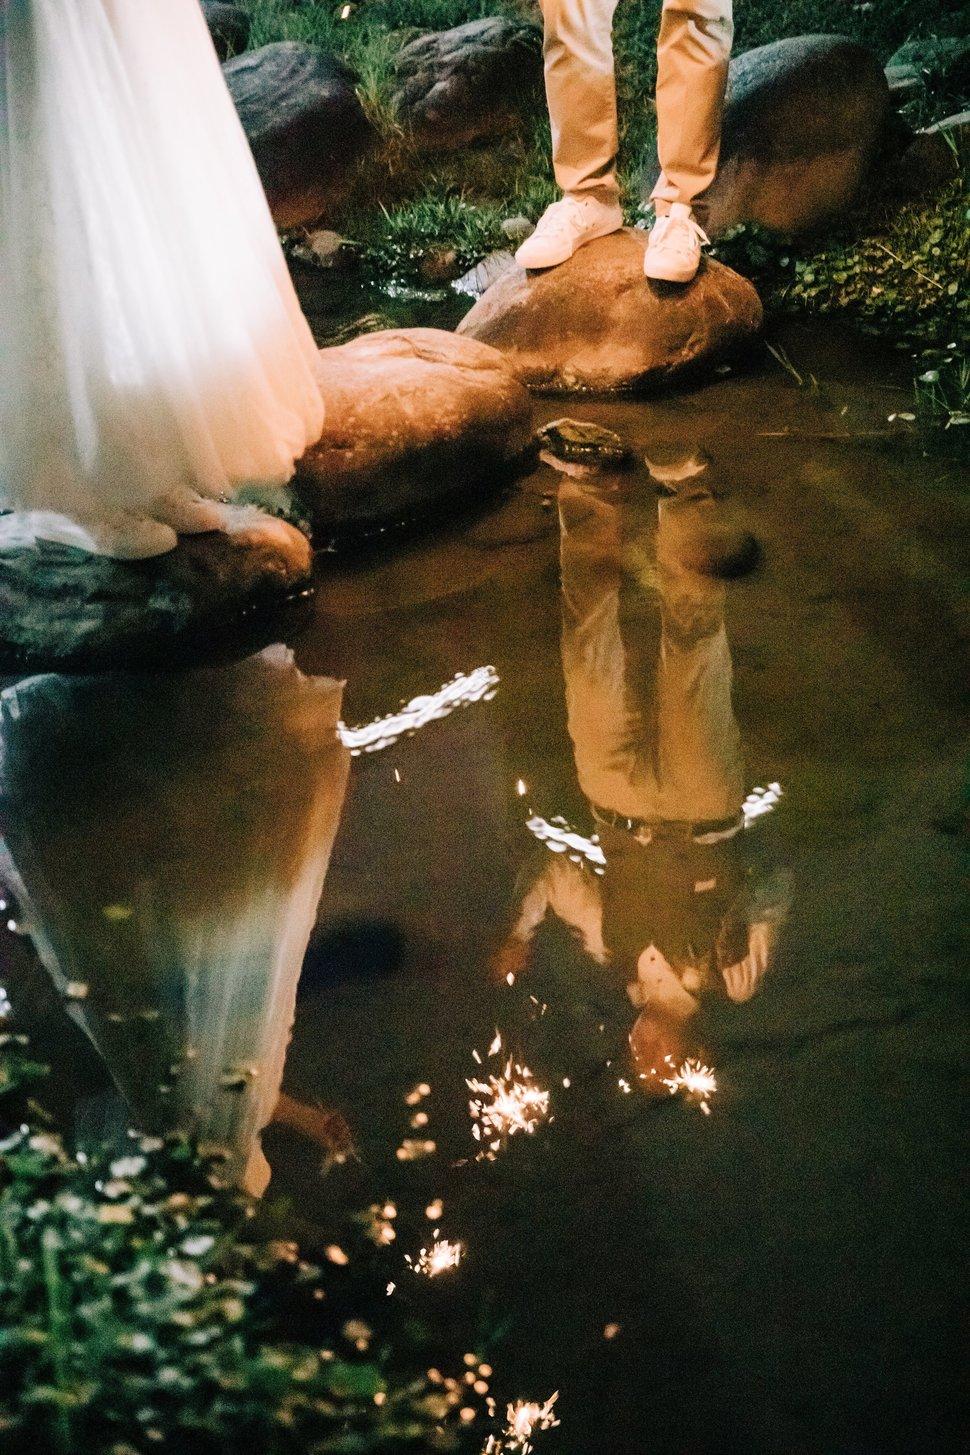 AG4_4662A - Cradle Wedding搖籃手工婚紗《結婚吧》